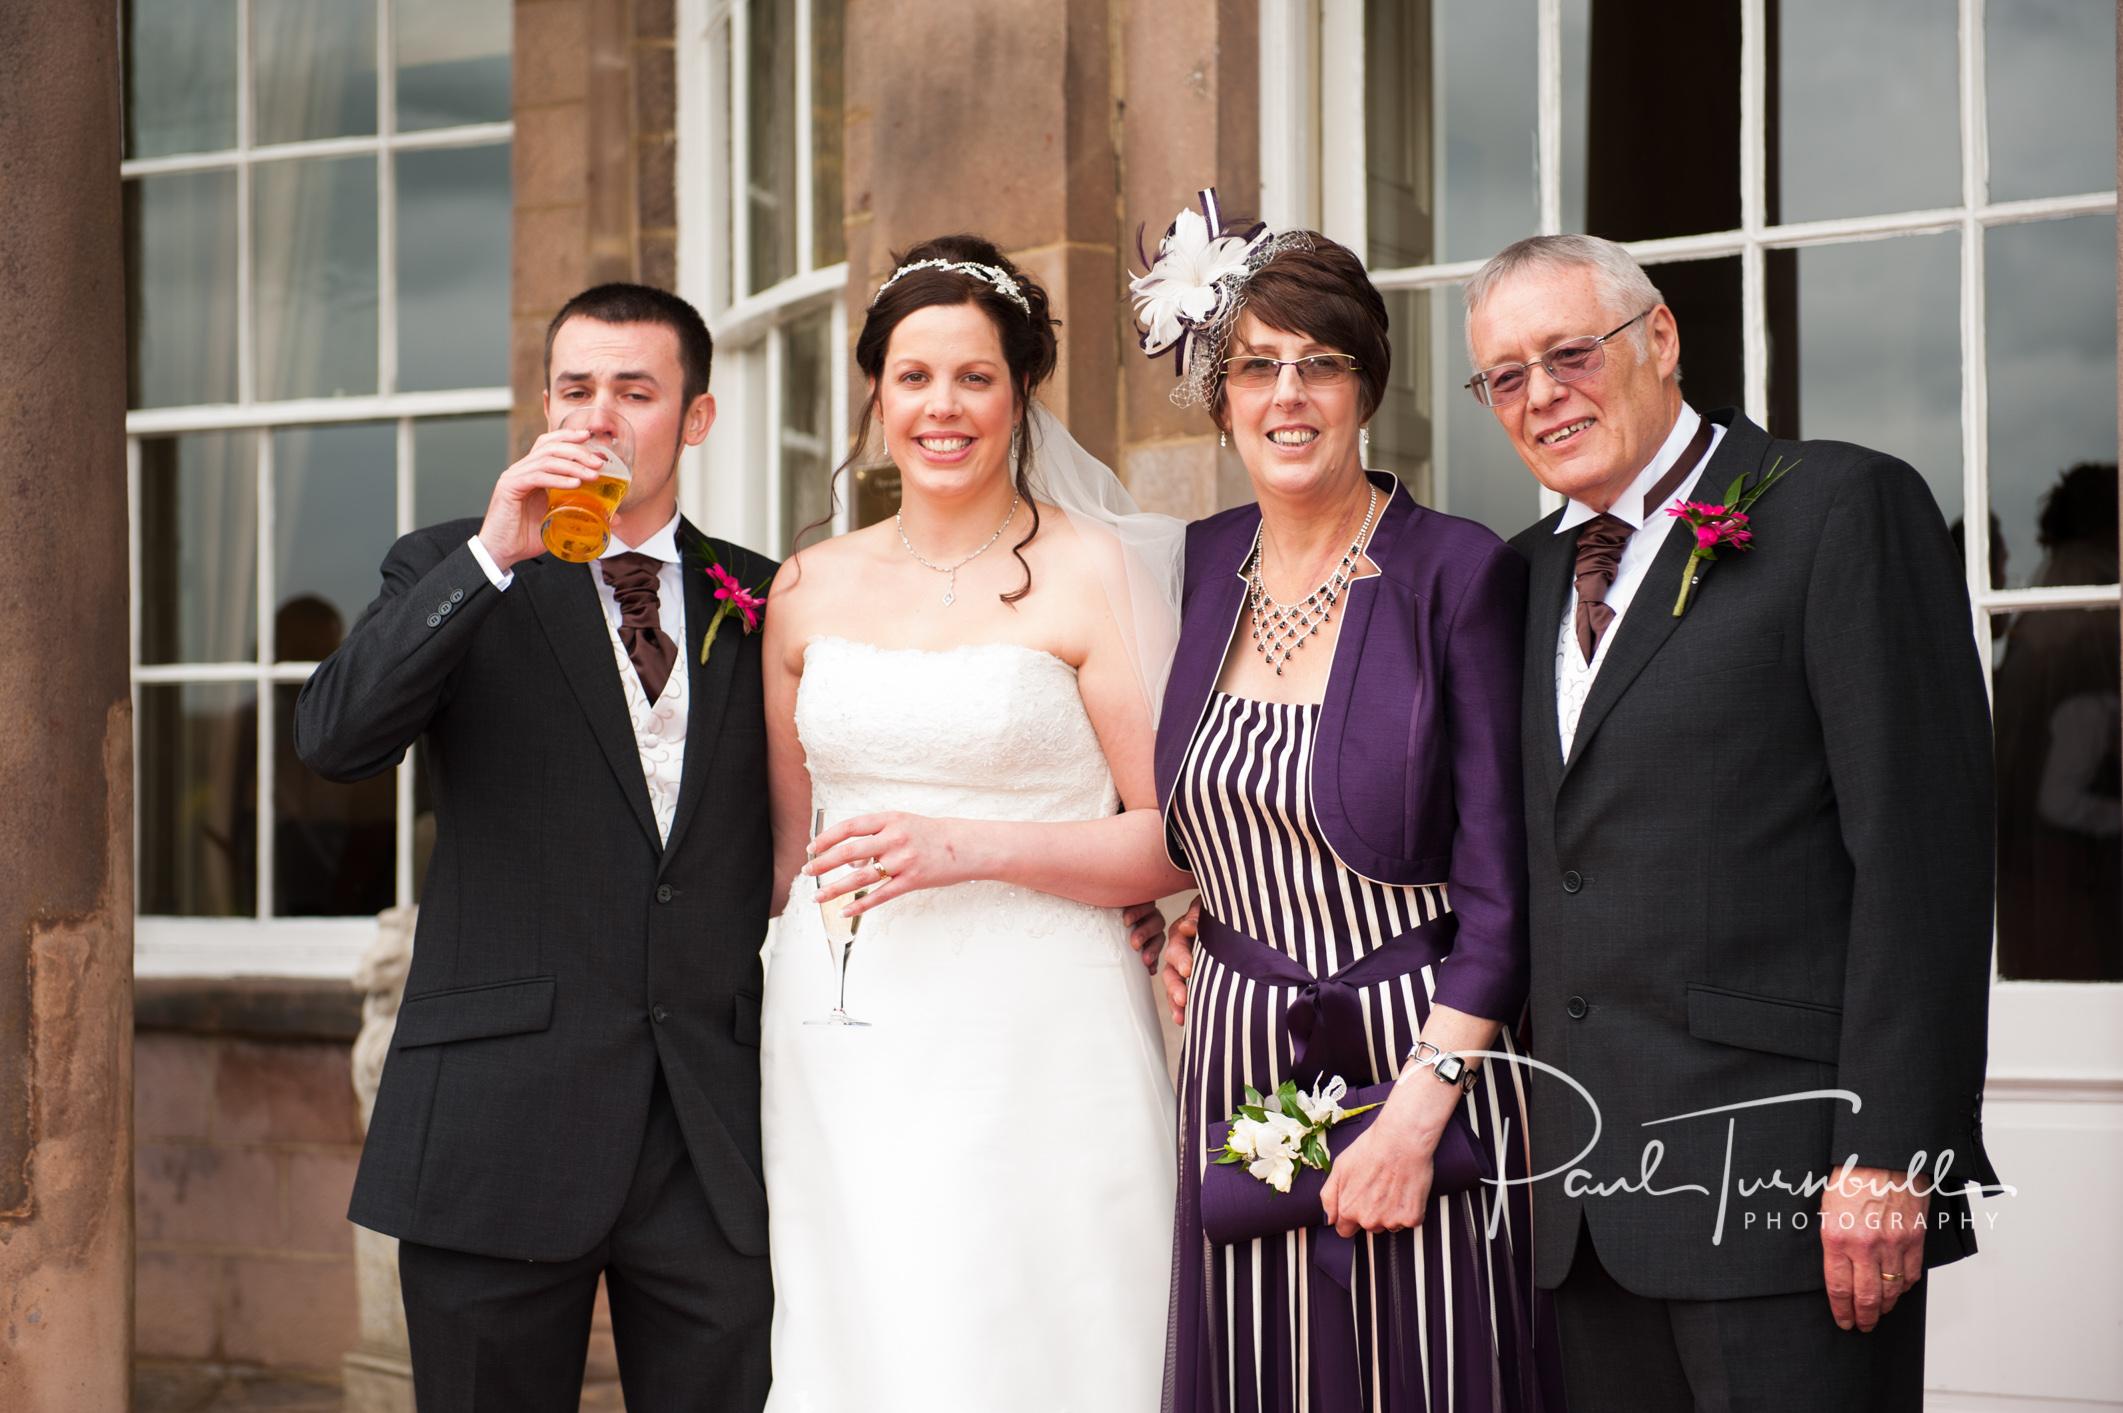 wedding-photography-wood-hall-wetherby-yorkshire-045.jpg